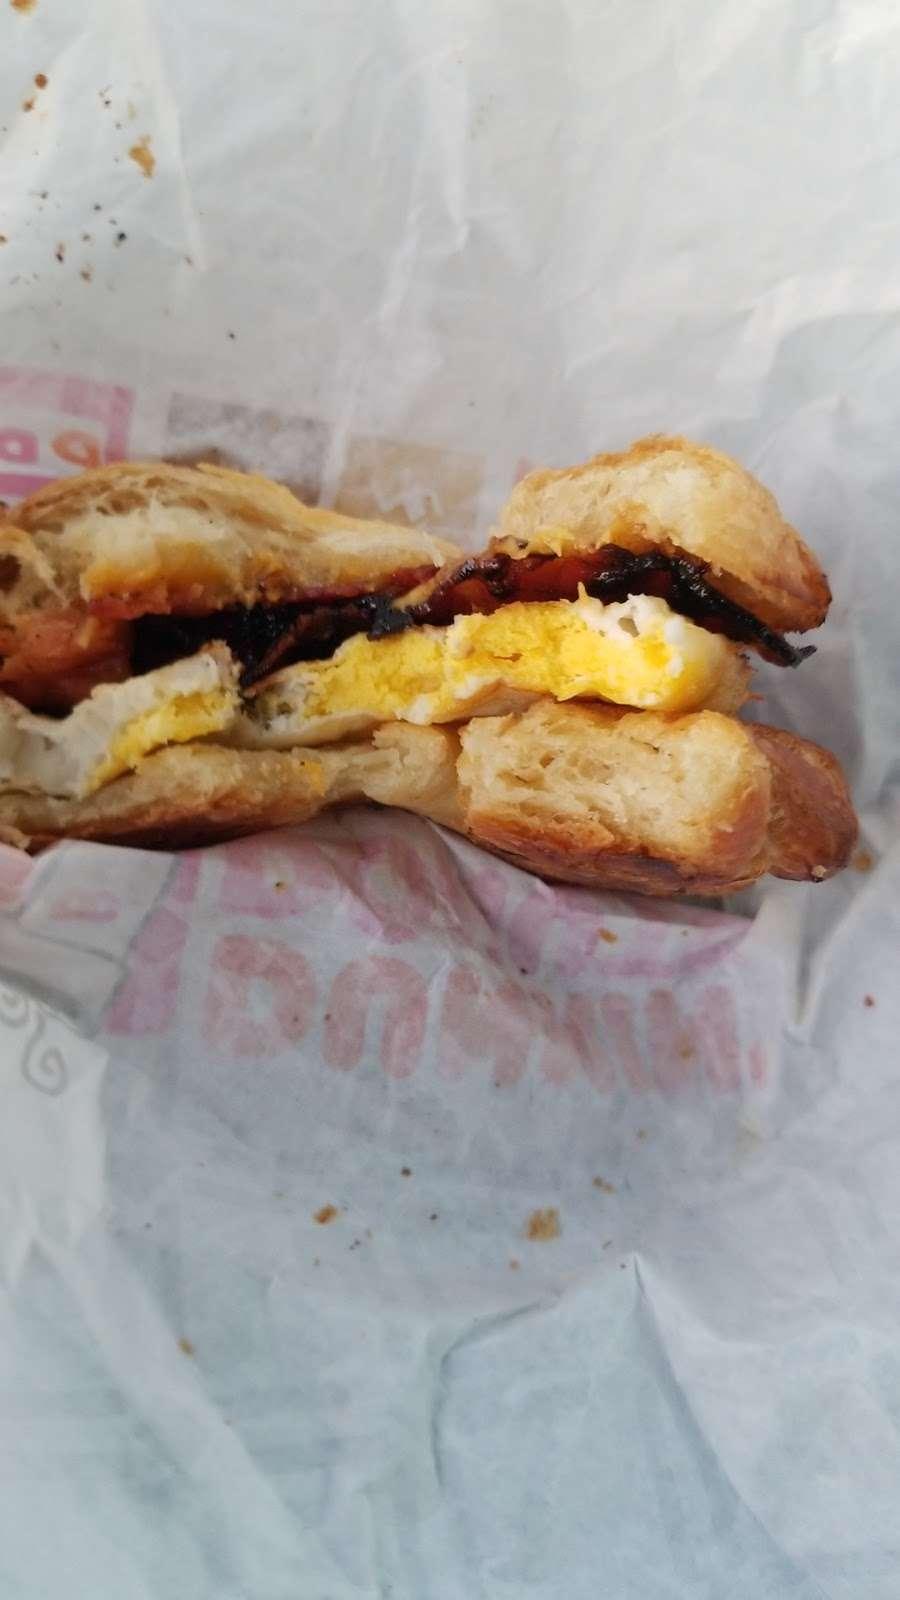 Dunkin Donuts - cafe  | Photo 2 of 10 | Address: 7125 W Oakland Park Blvd, Lauderhill, FL 33313, USA | Phone: (954) 742-8511